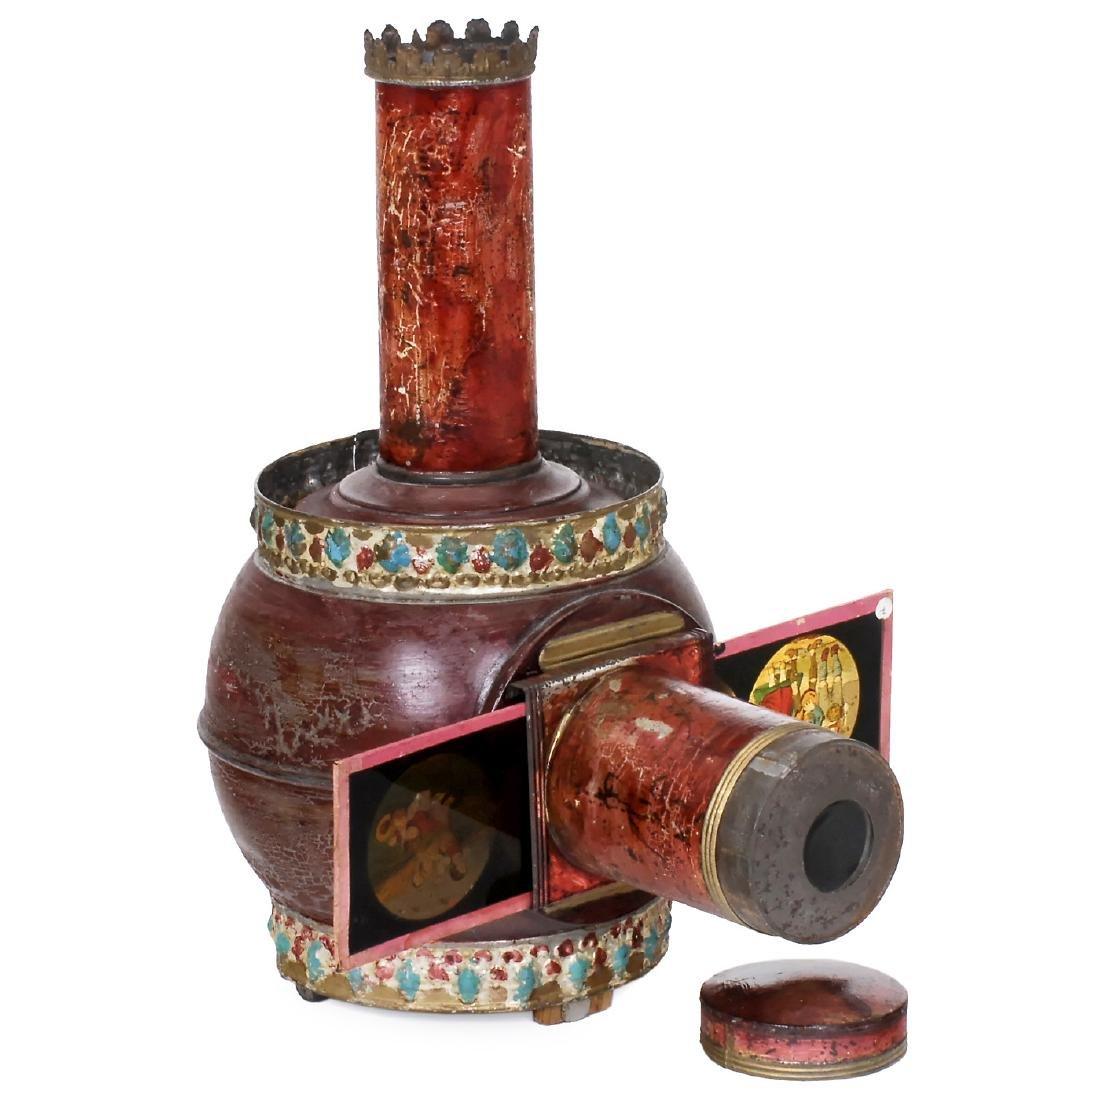 Lampascope Boule Magic Lantern, c. 1870